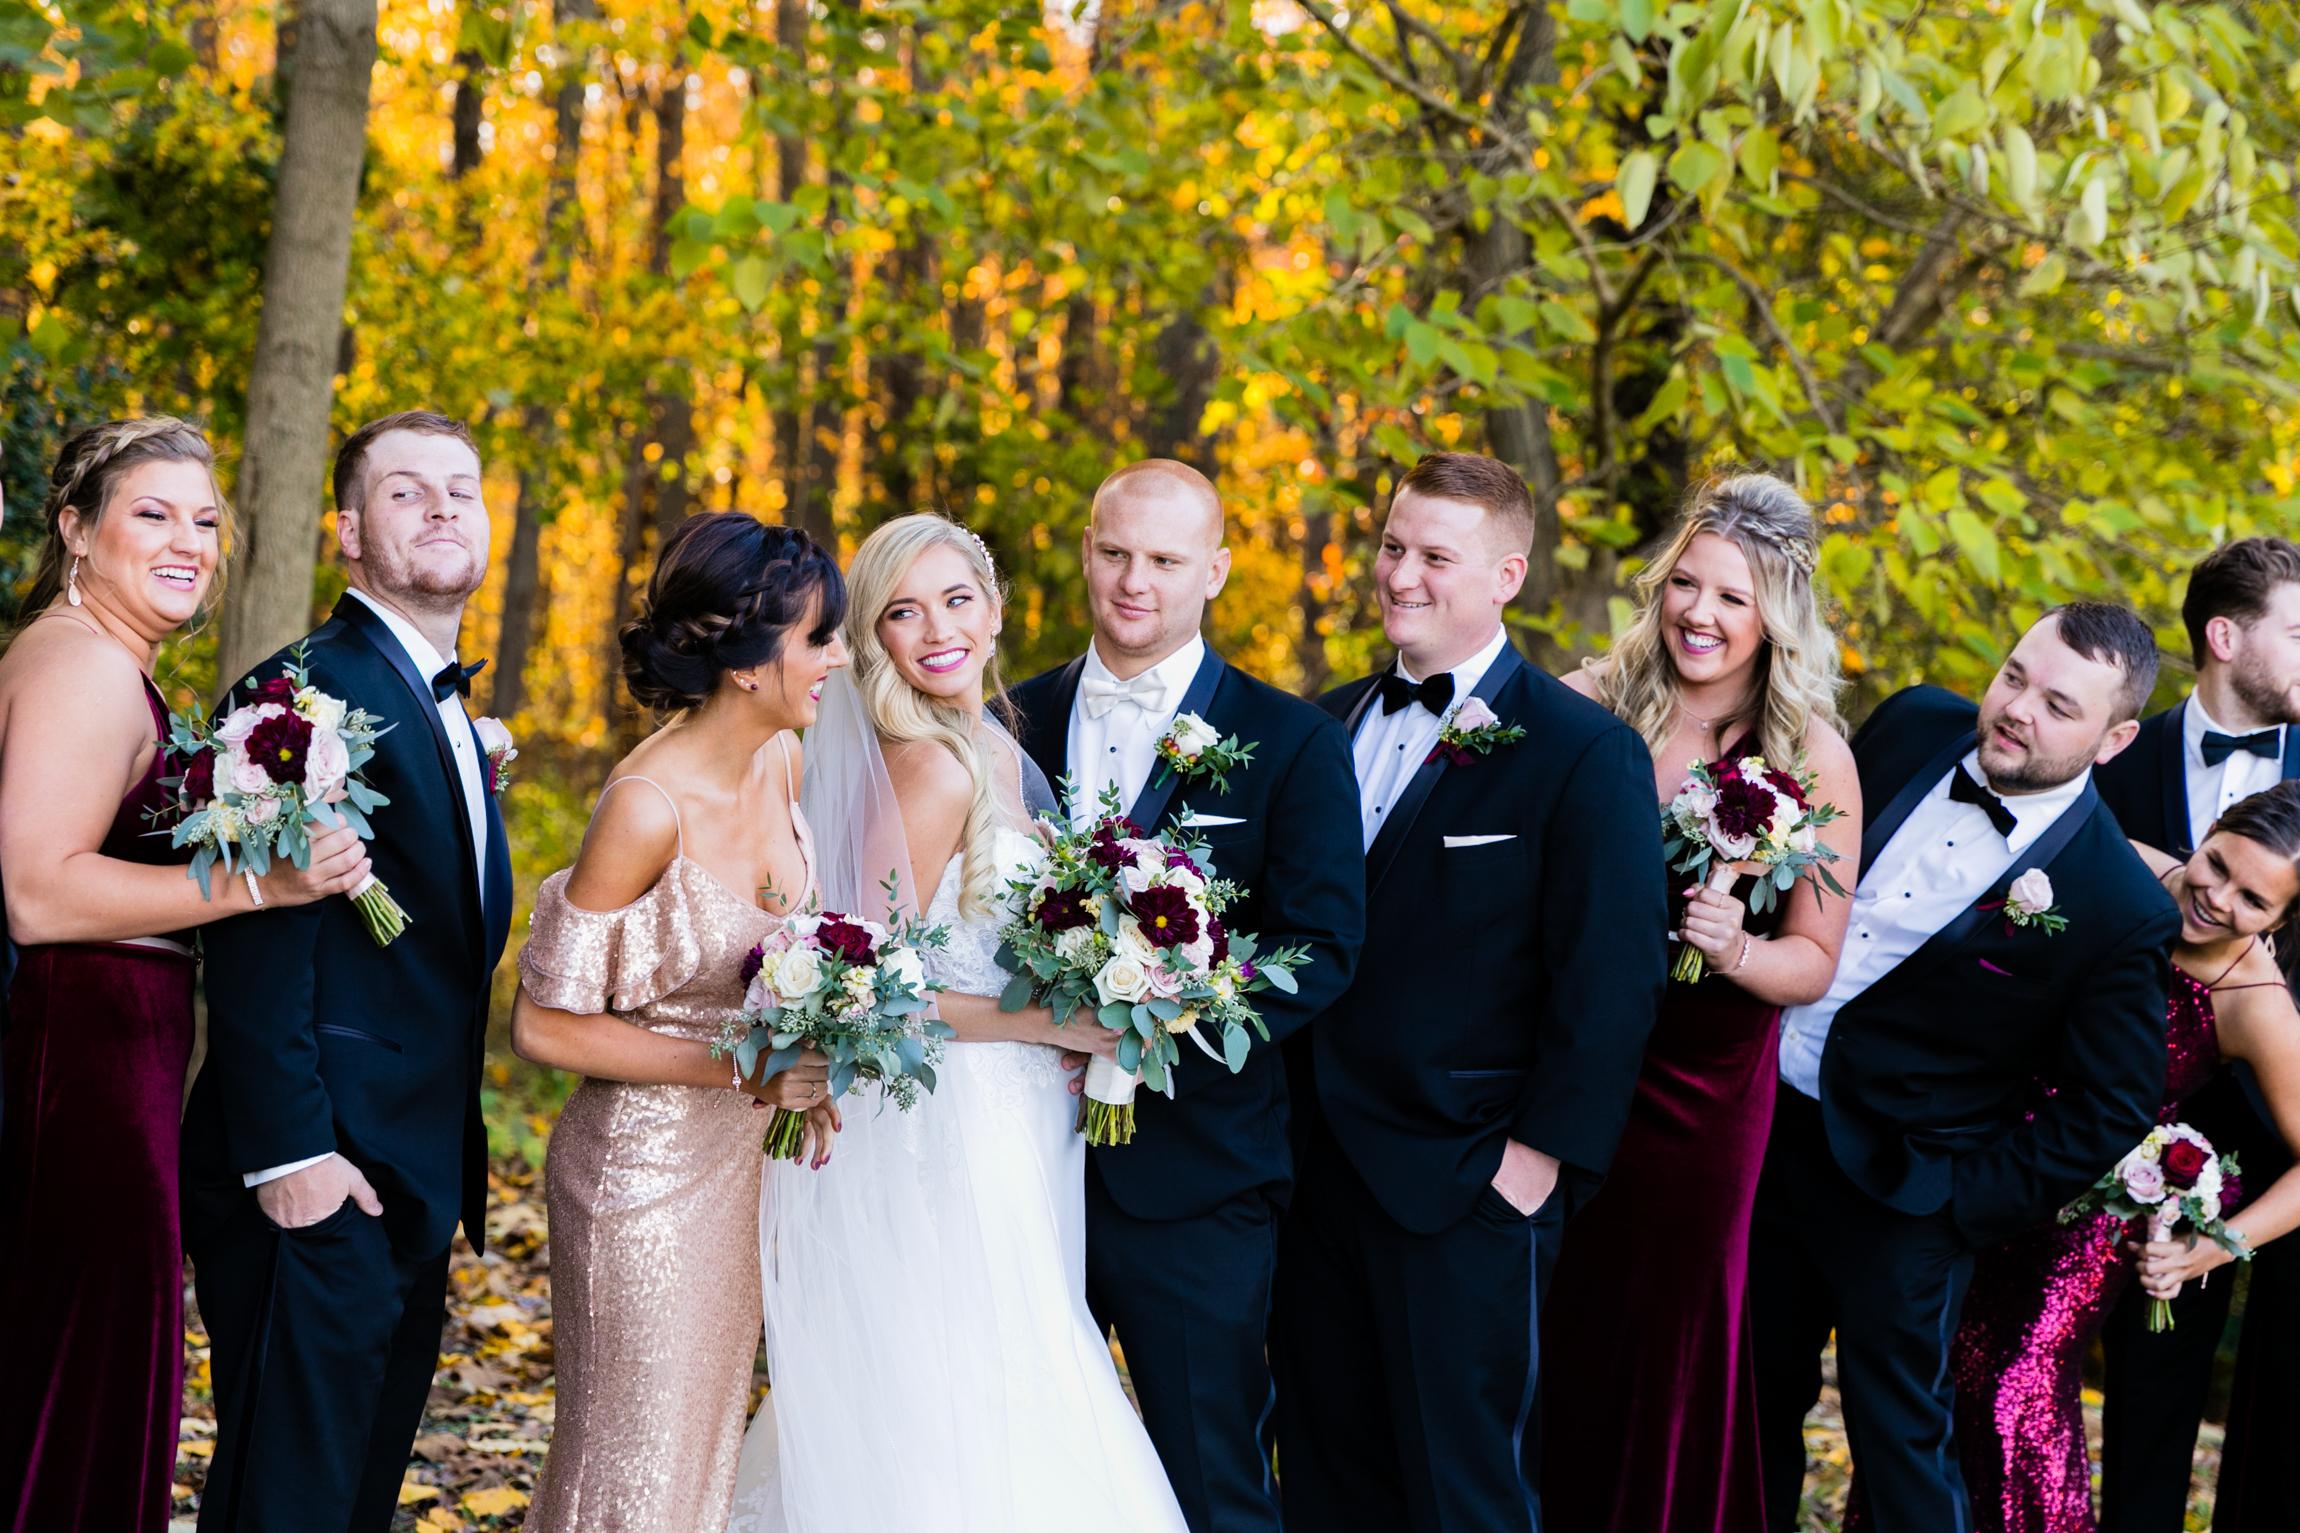 Luciens Manor - Wedding Photography -072.jpg